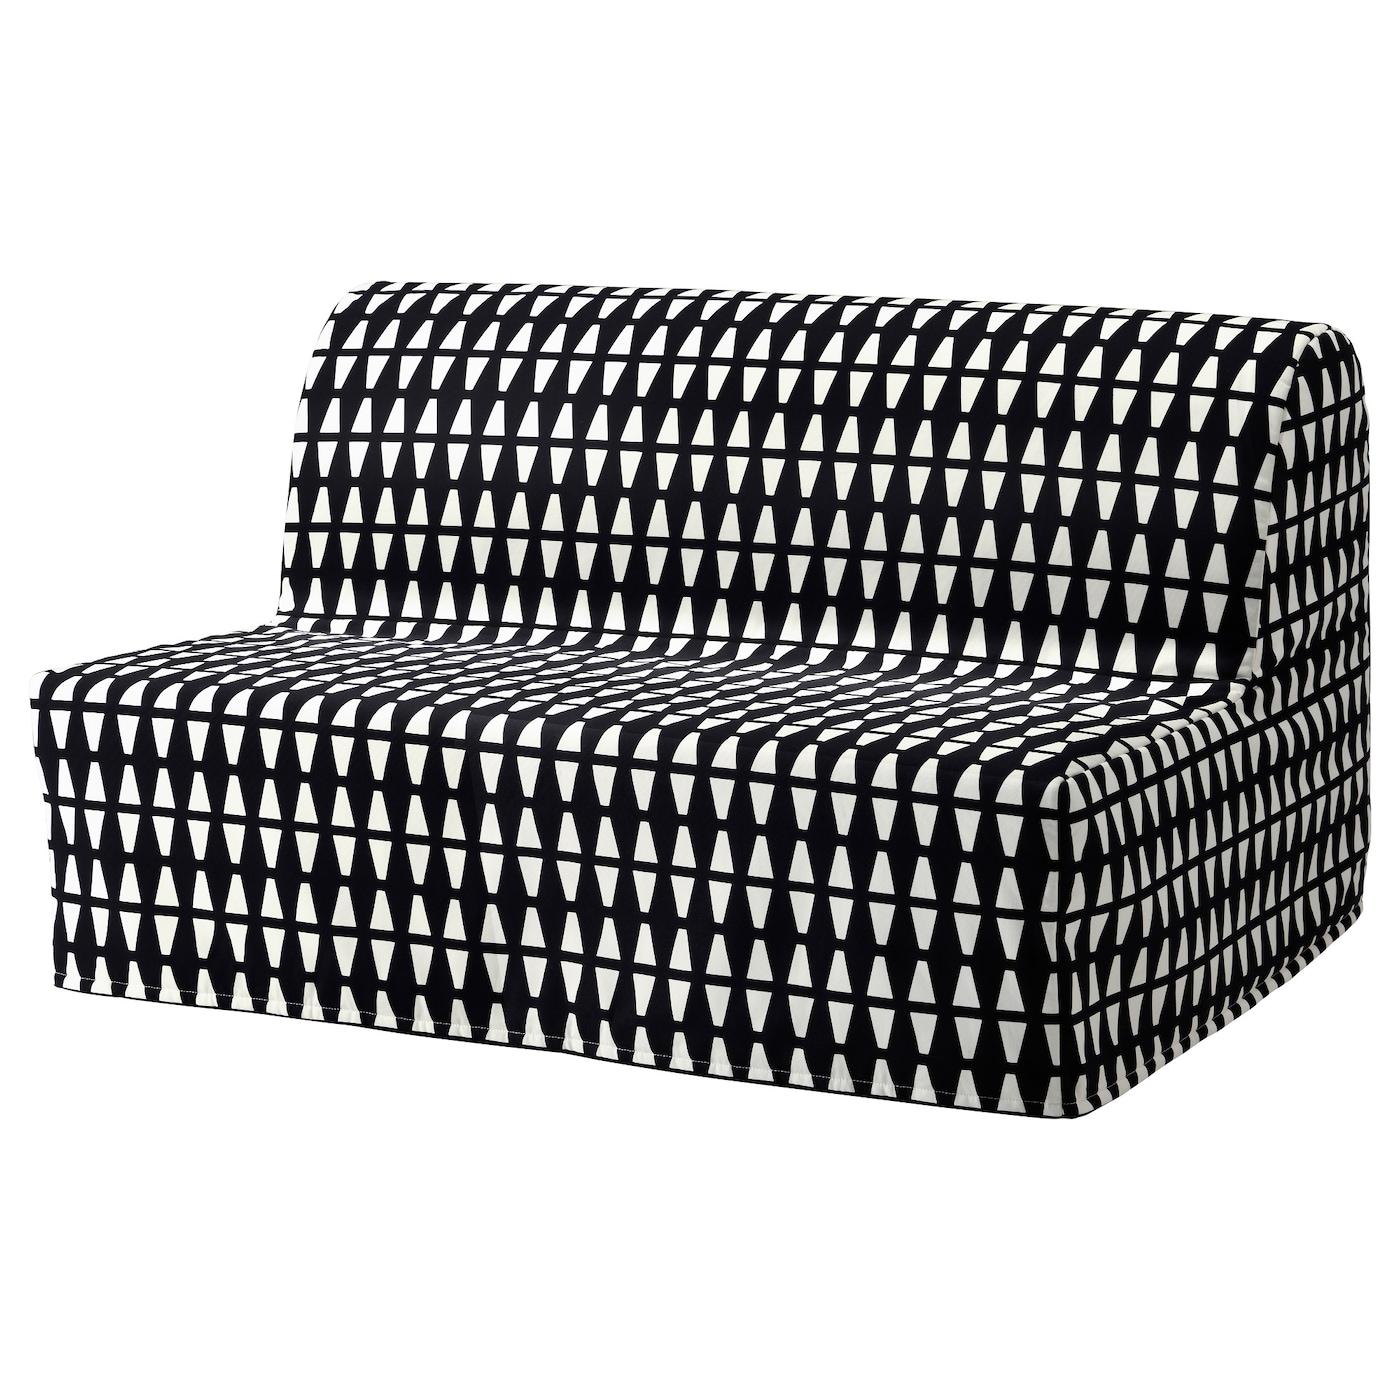 LYCKSELE - Sleeper sofa slipcover, Vallarum gray